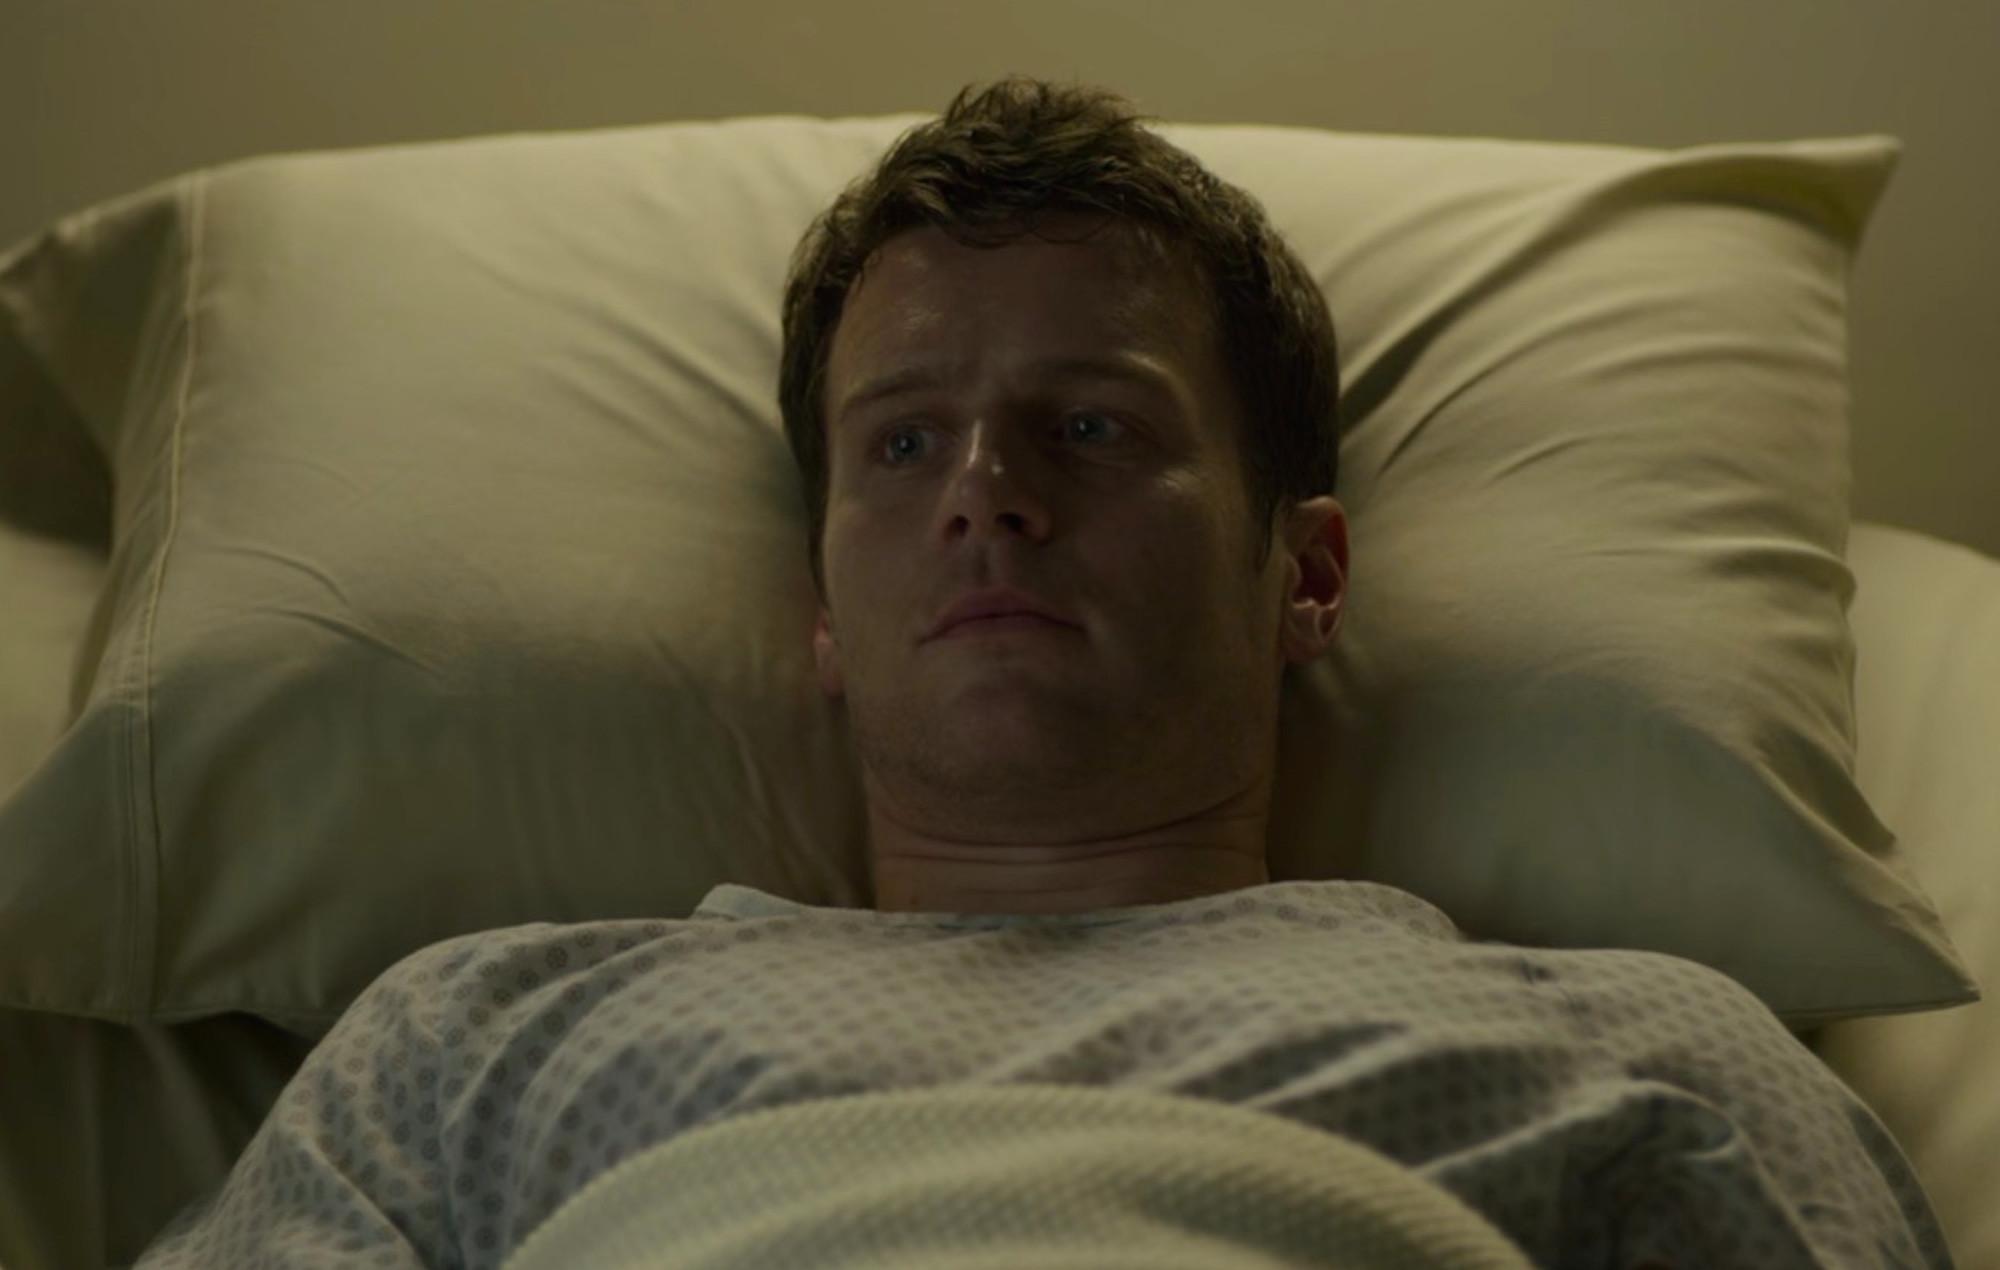 Mindhunter' season 2 episode 1 review: David Fincher back